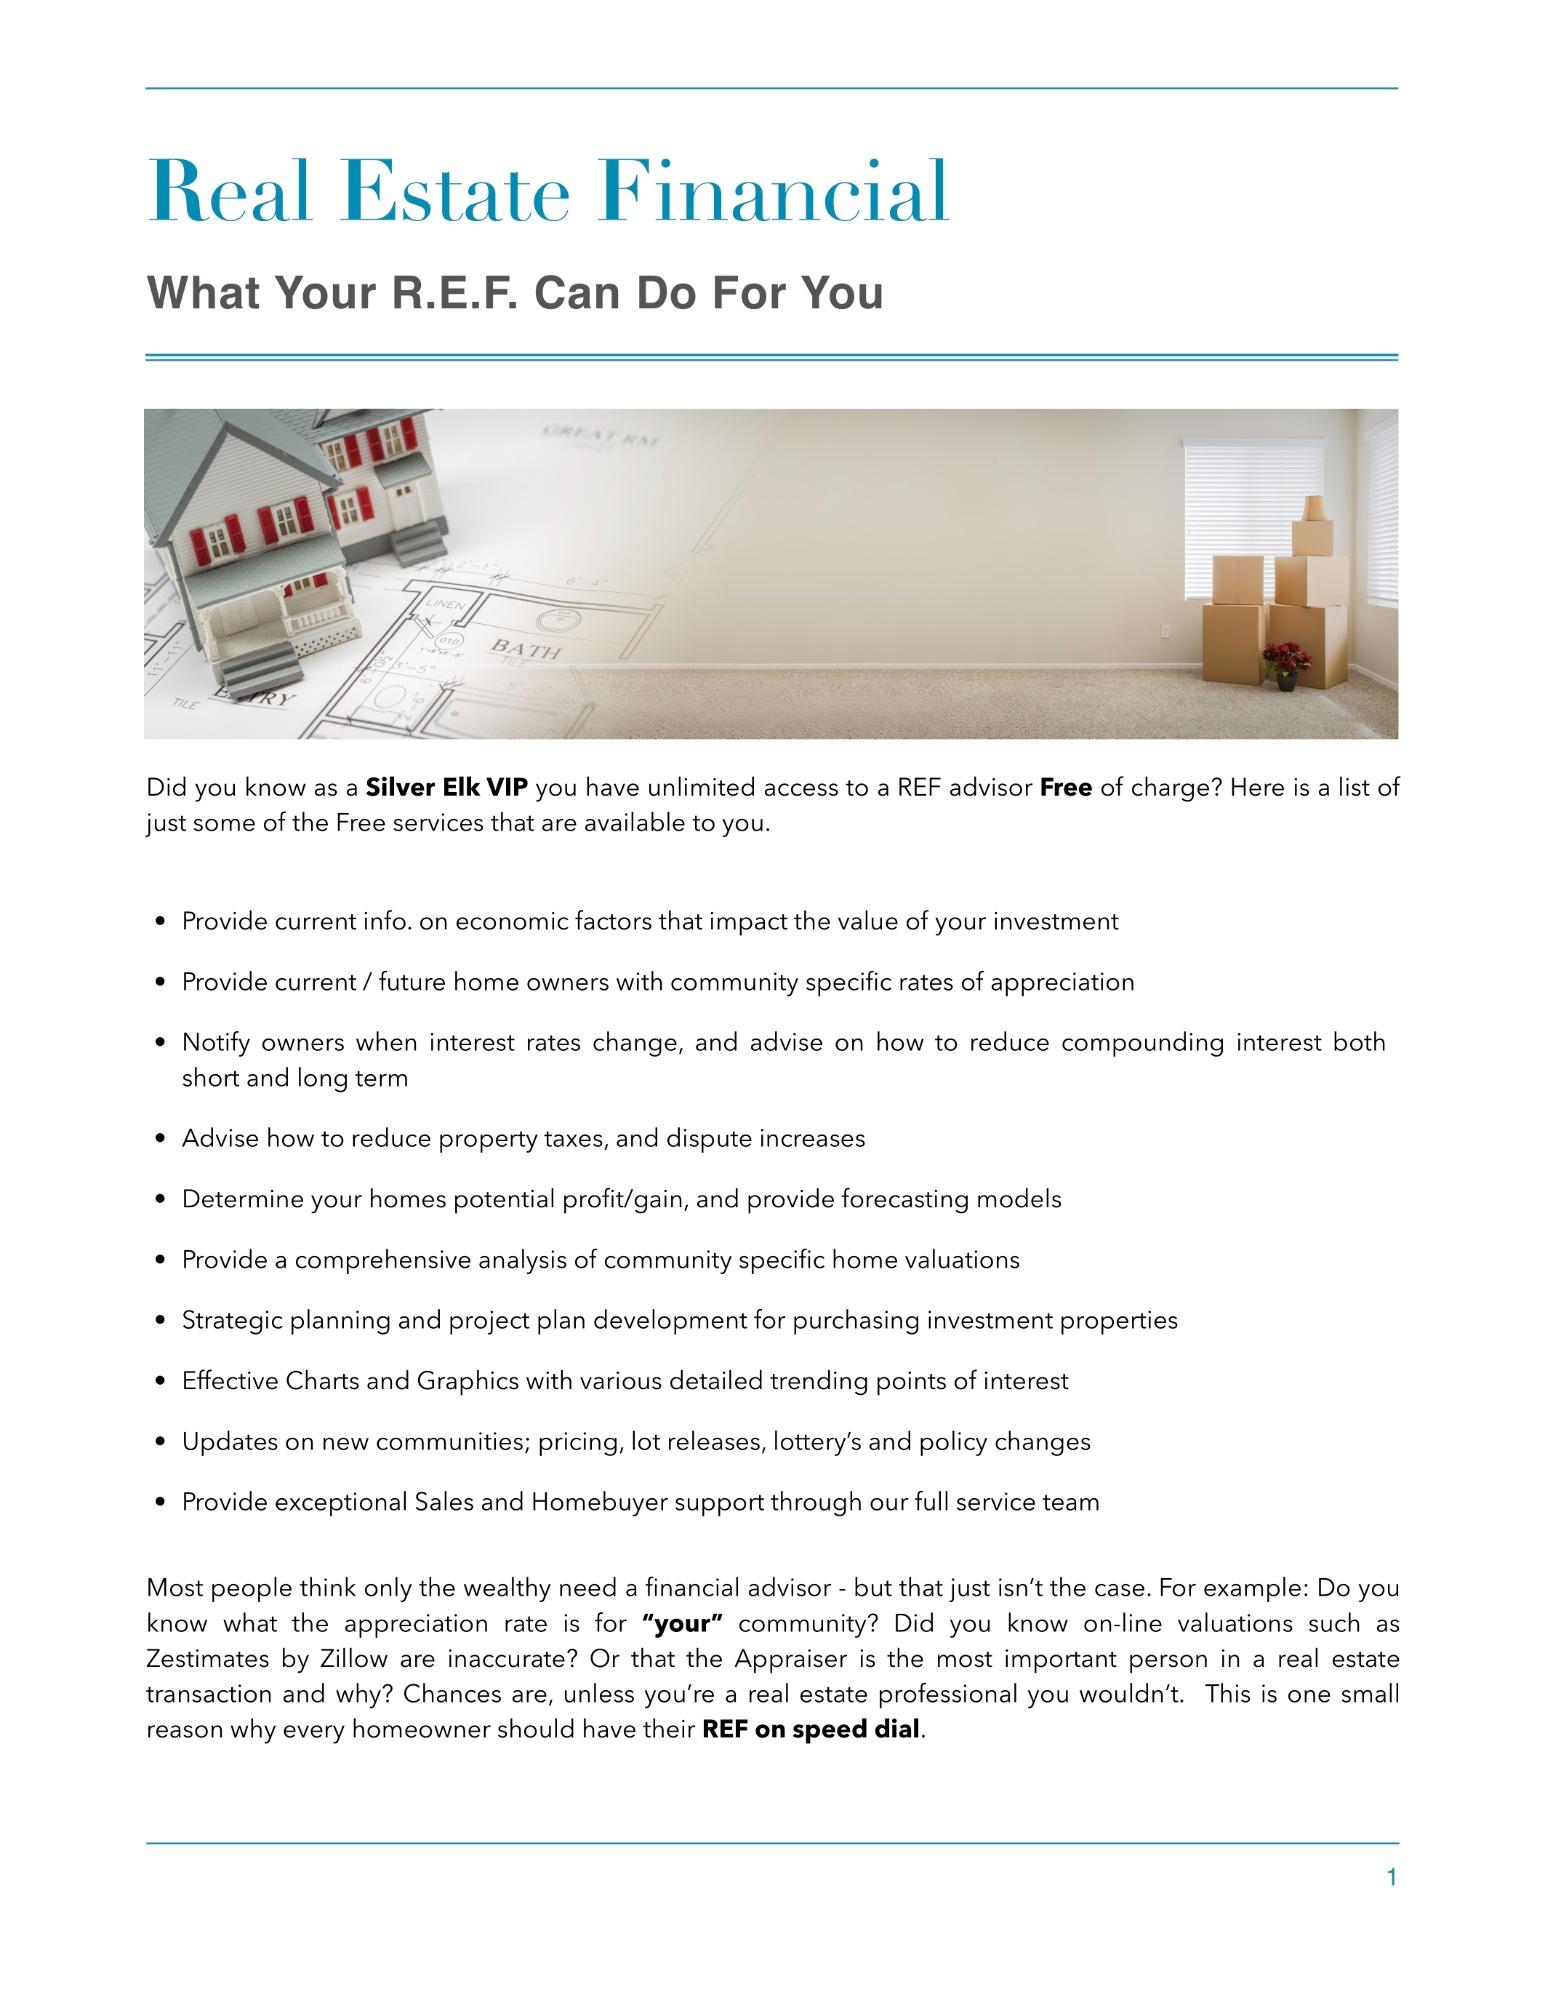 Real Estate Financial Advisor